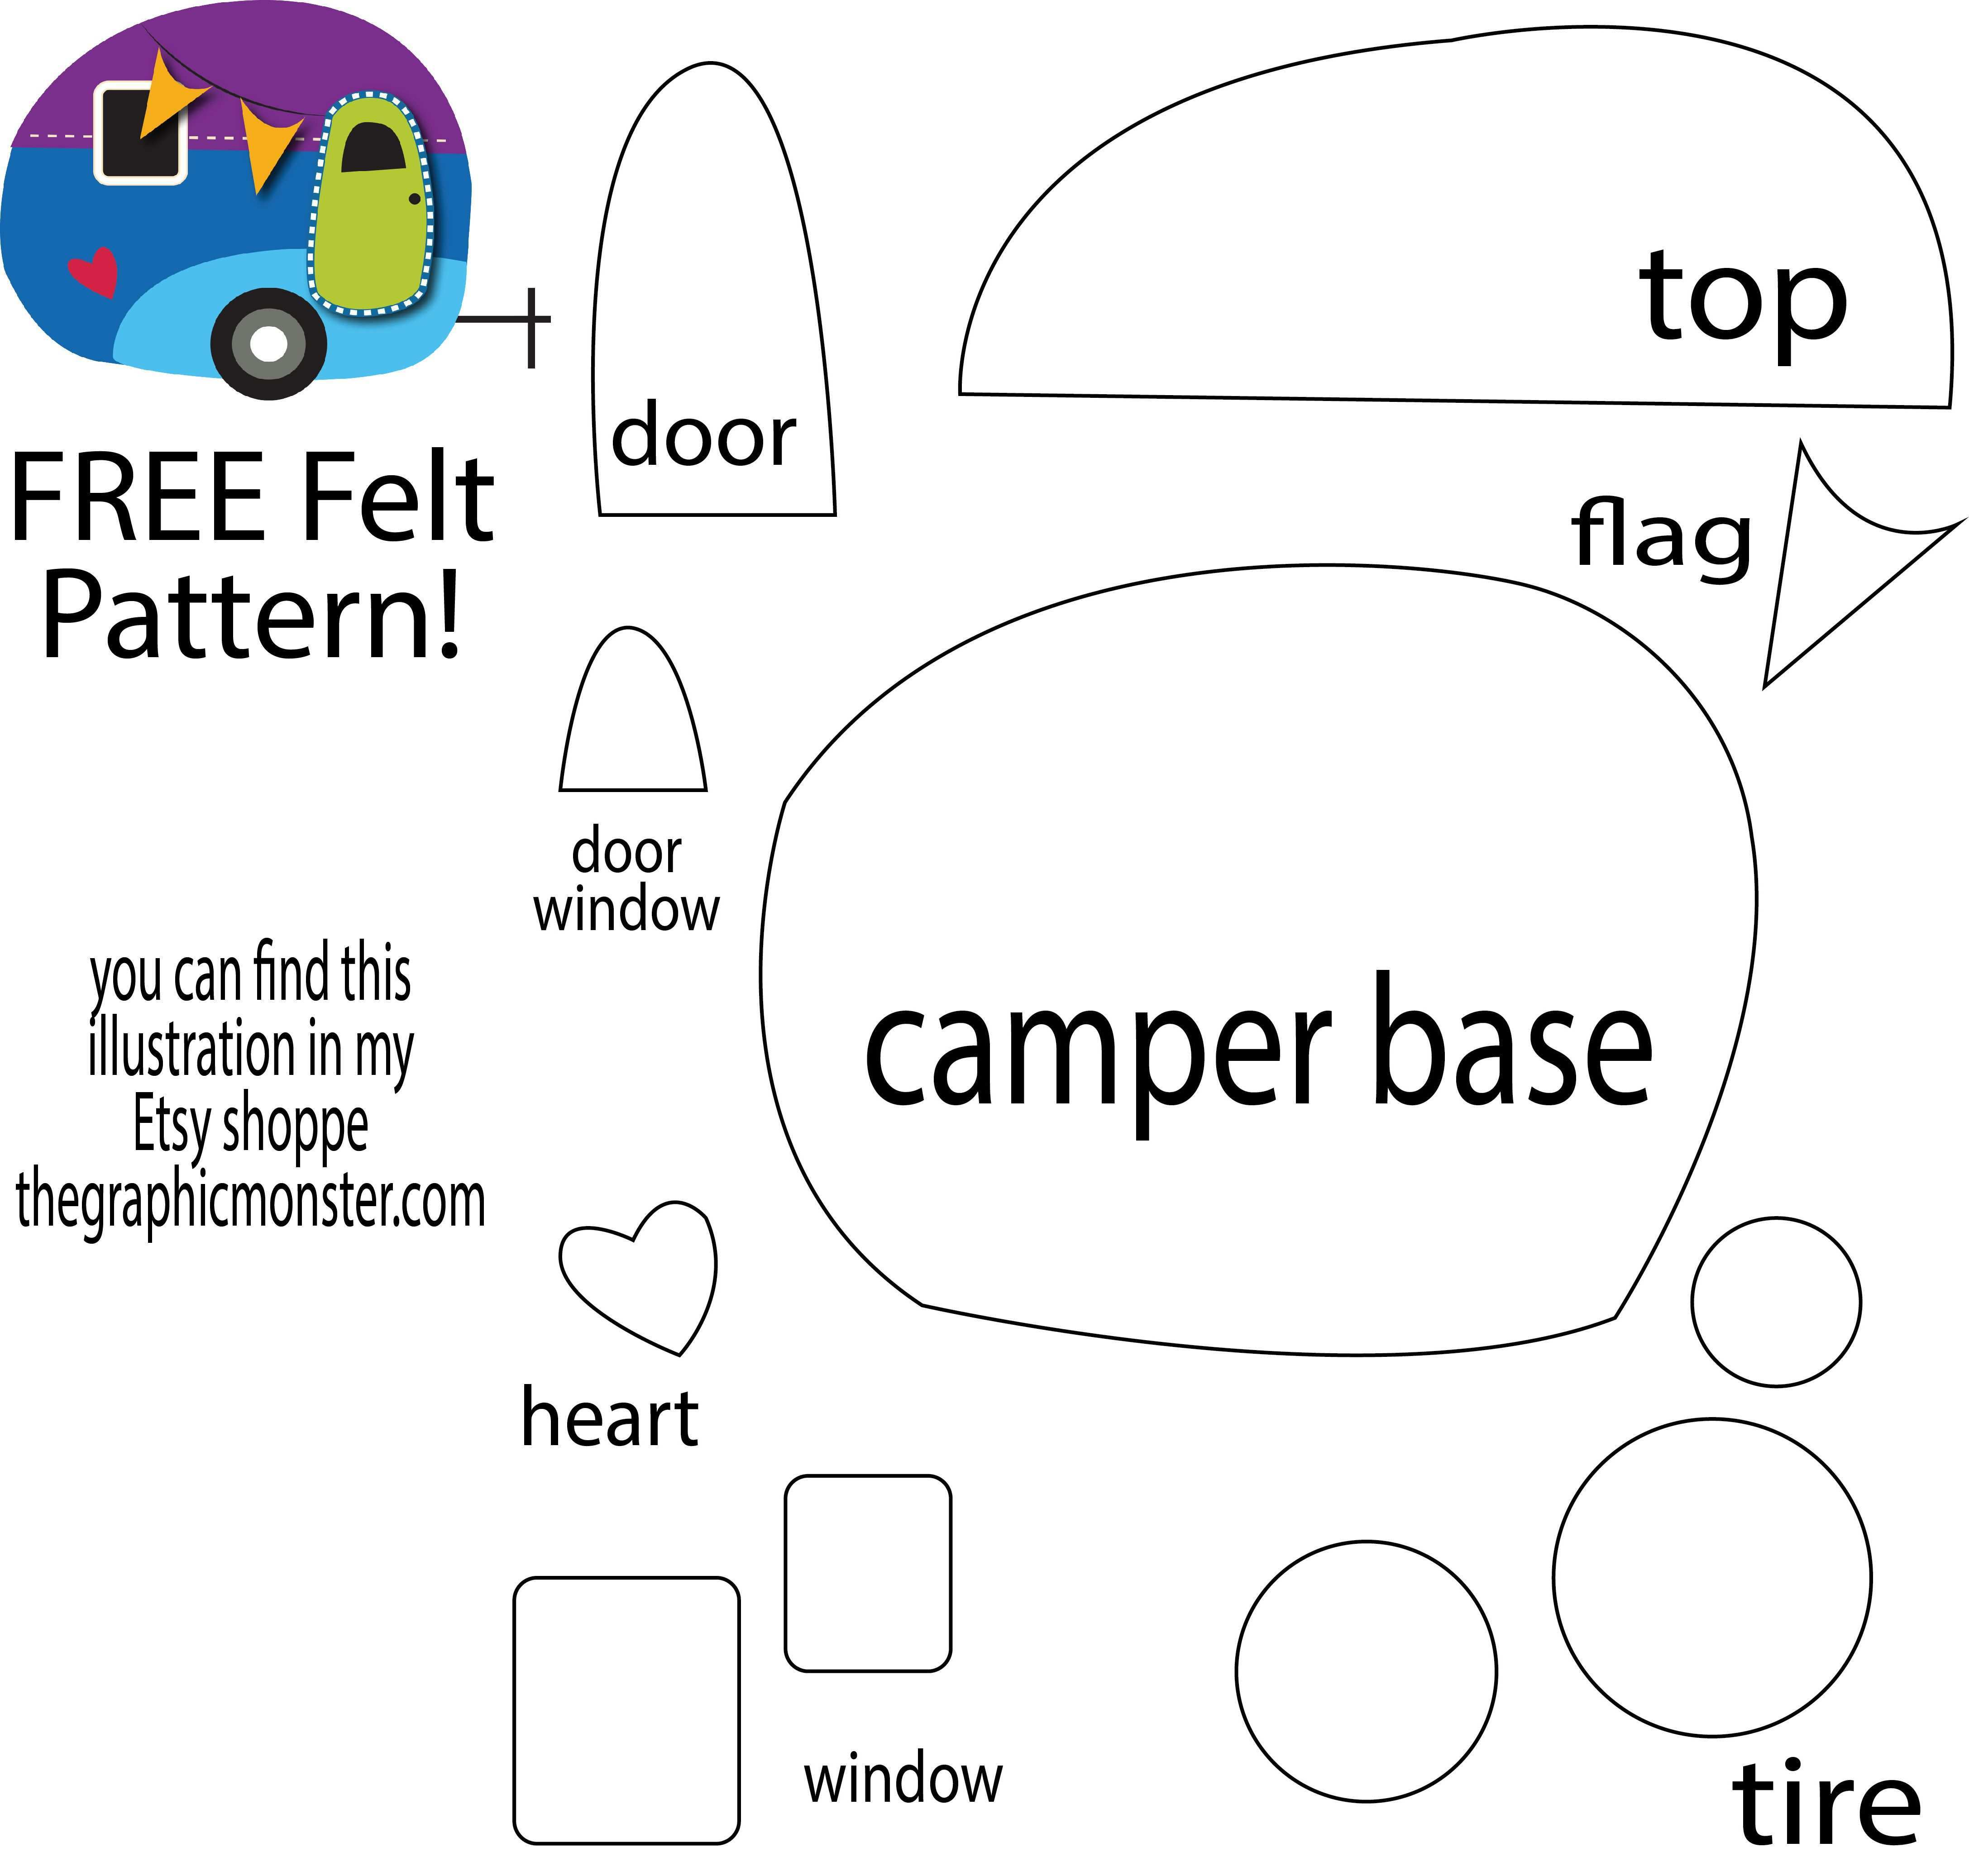 Free Felt Pattern From My Cute Camper Illustration Thegraphicmonster Com Felt Ornaments Patterns Felt Christmas Ornaments Felt Pattern